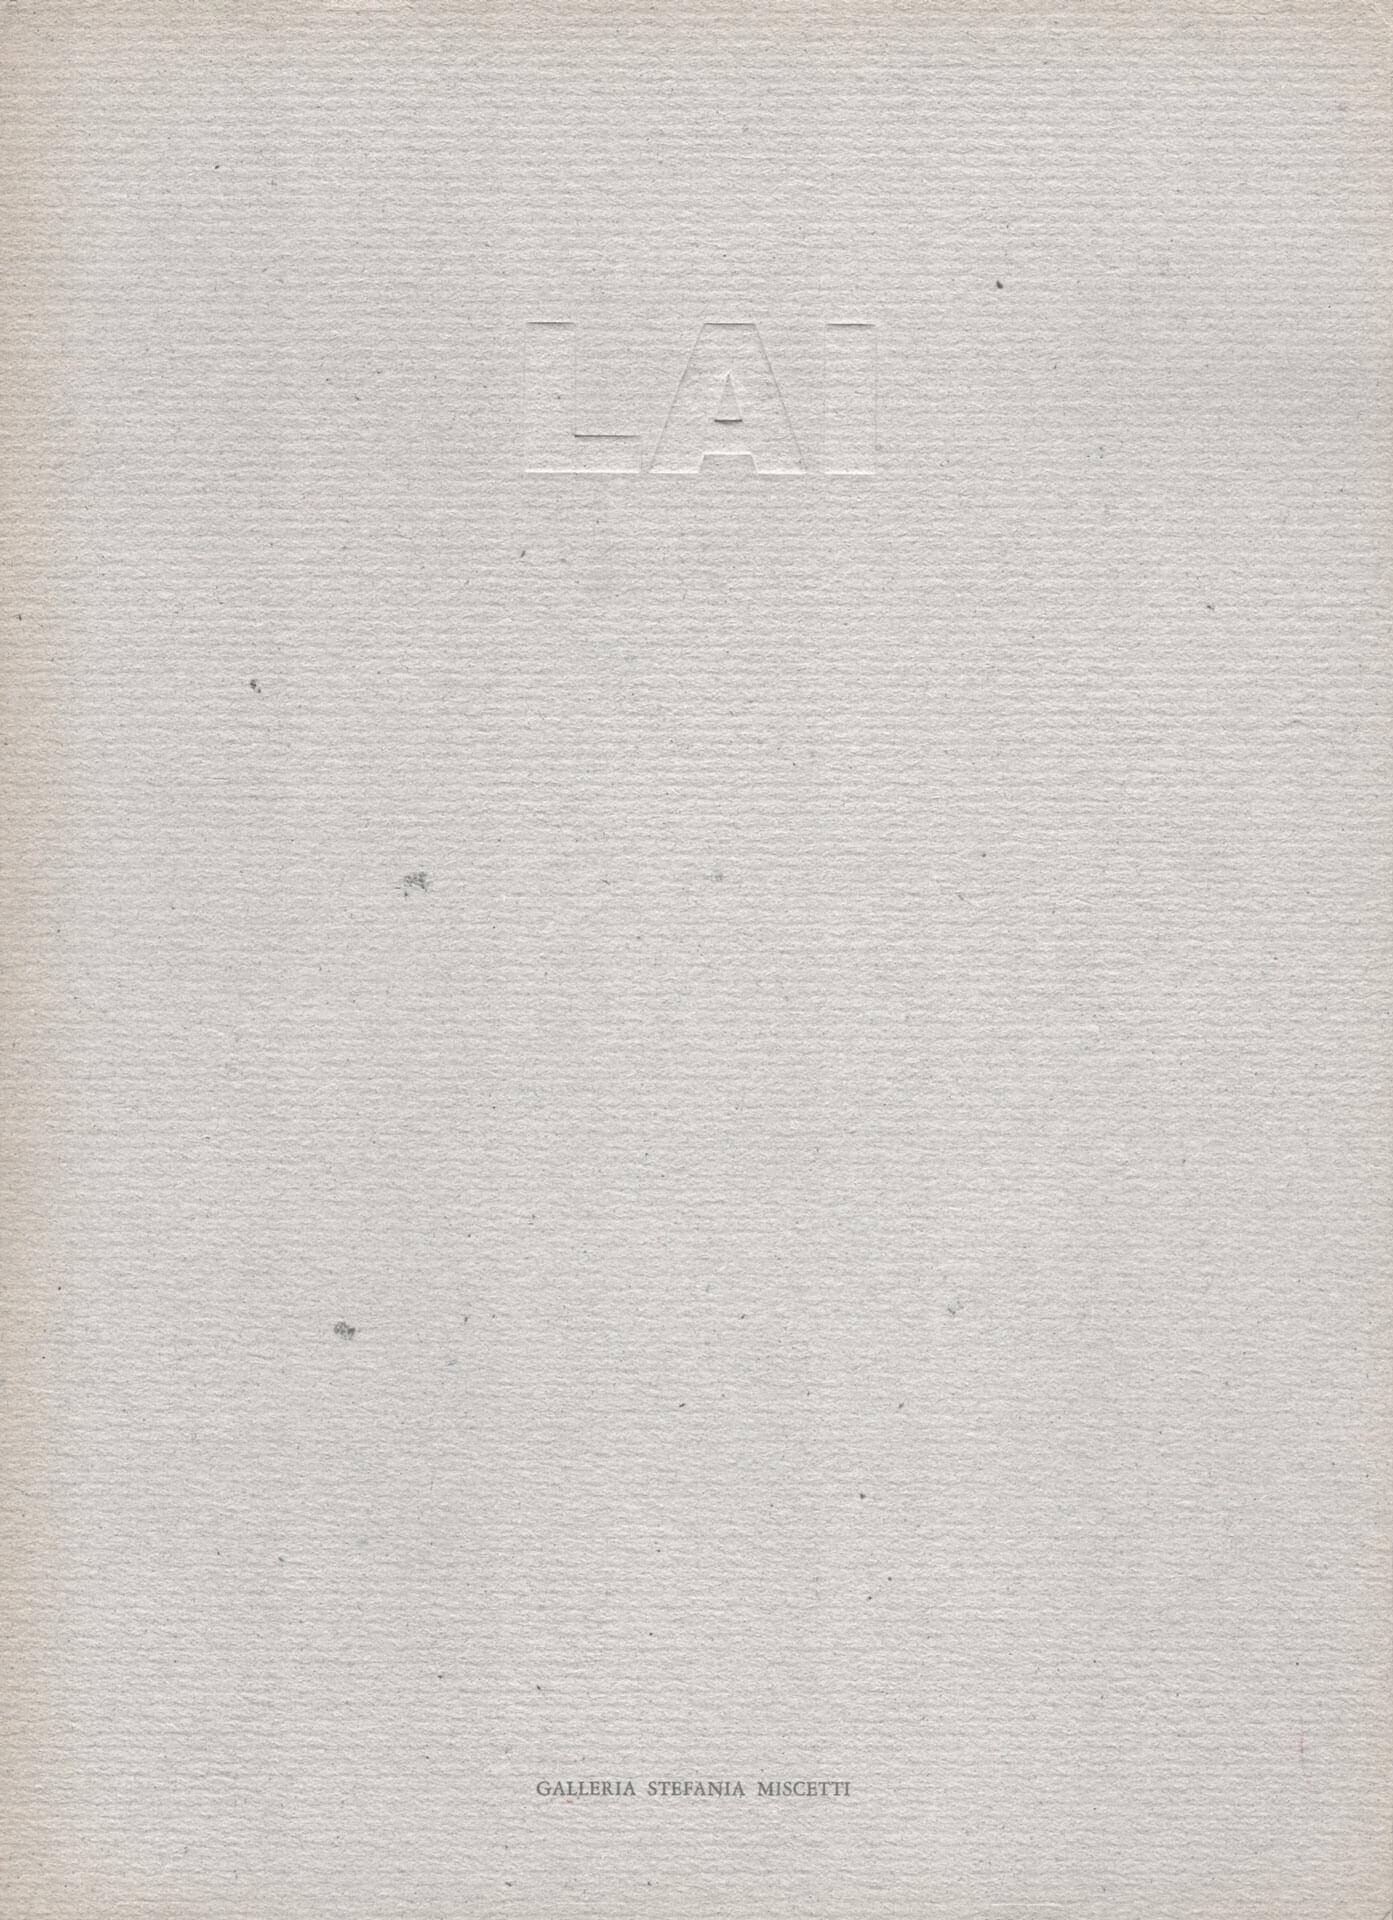 Studio Stefania Miscetti | Catalogues | Maria Lai | Una fiaba infinita